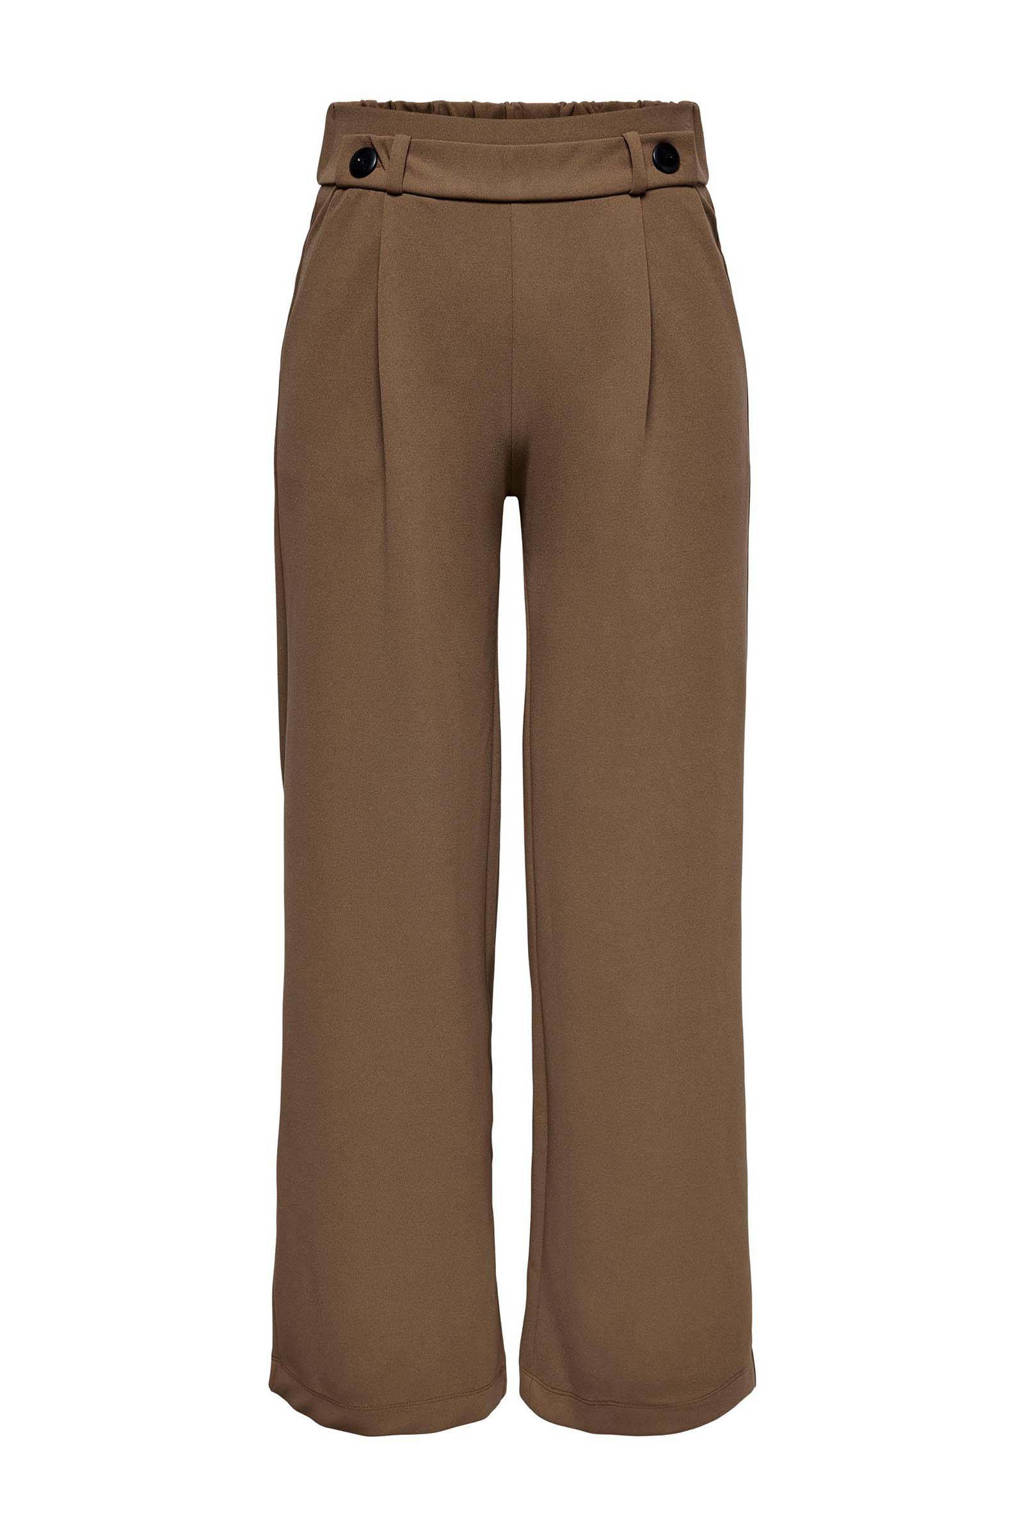 JDY cropped high waist loose fit palazzo broek JDYGEGGO bruin, Bruin